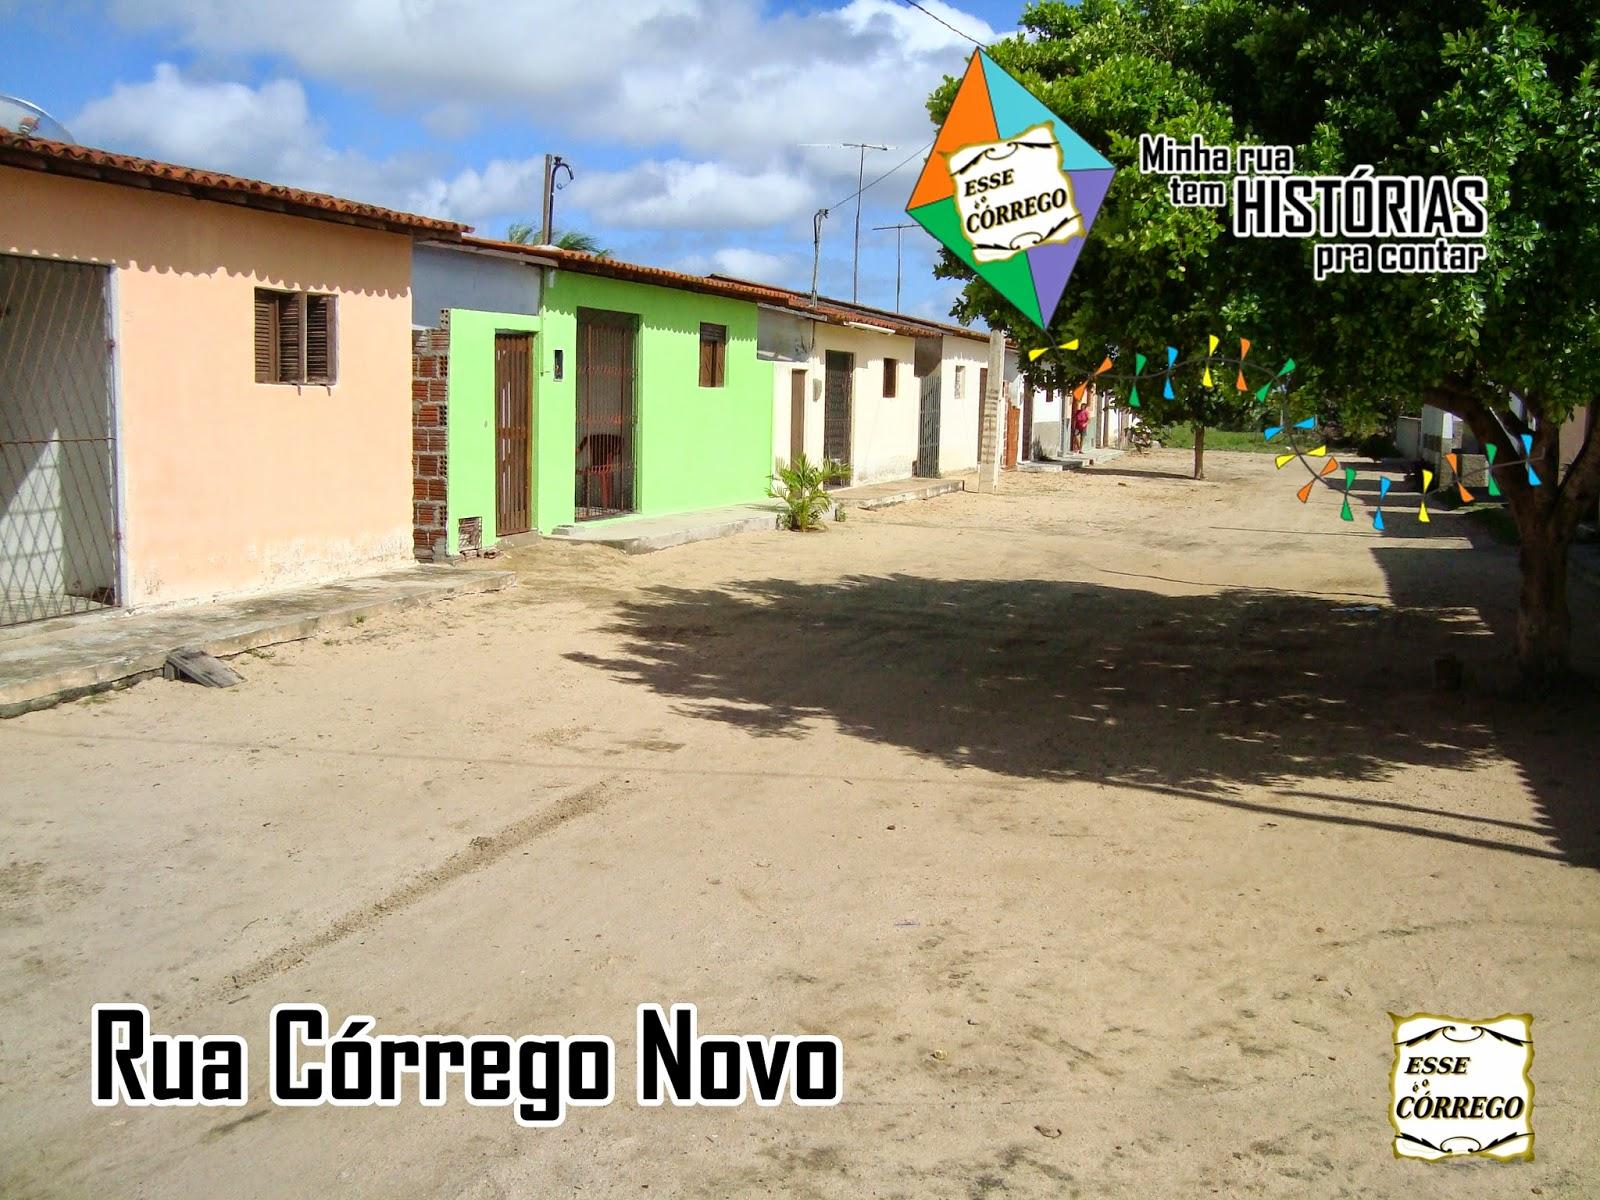 Rua Córrego Novo